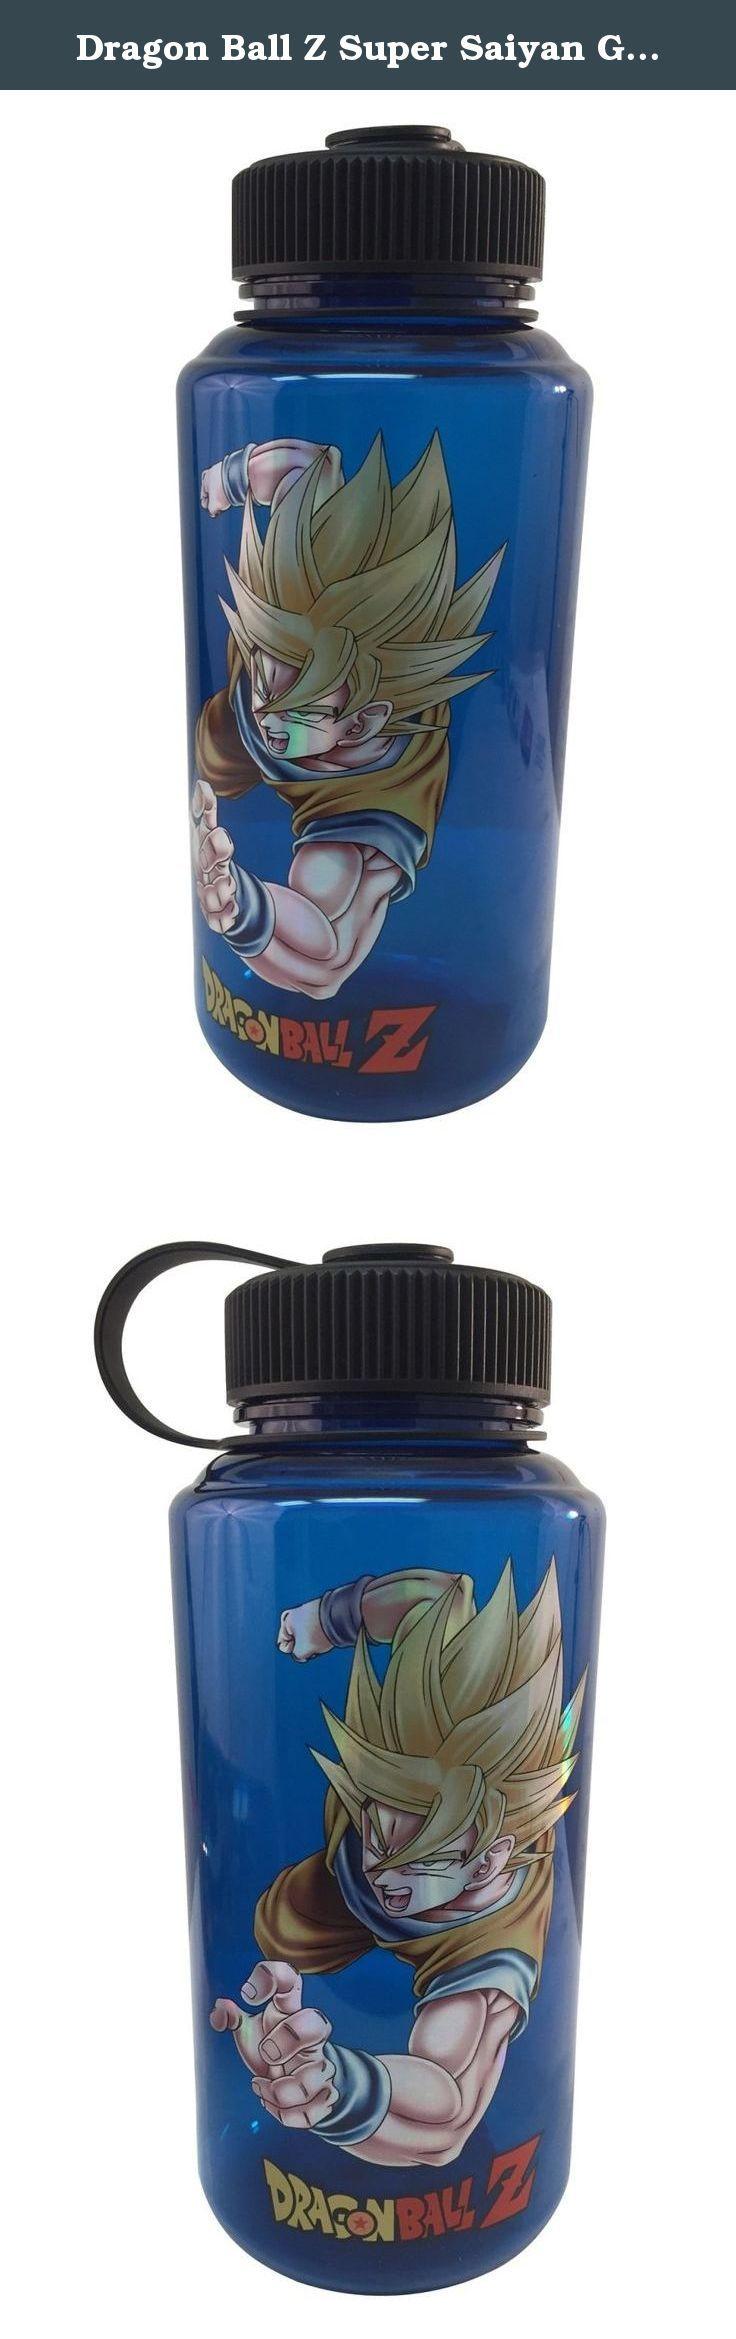 Dragon Ball Z Super Saiyan Goku Anime 24 oz. Water Bottle. Dragon Ball Z Super Saiyan Goku Anime 24 oz. Water Bottle.